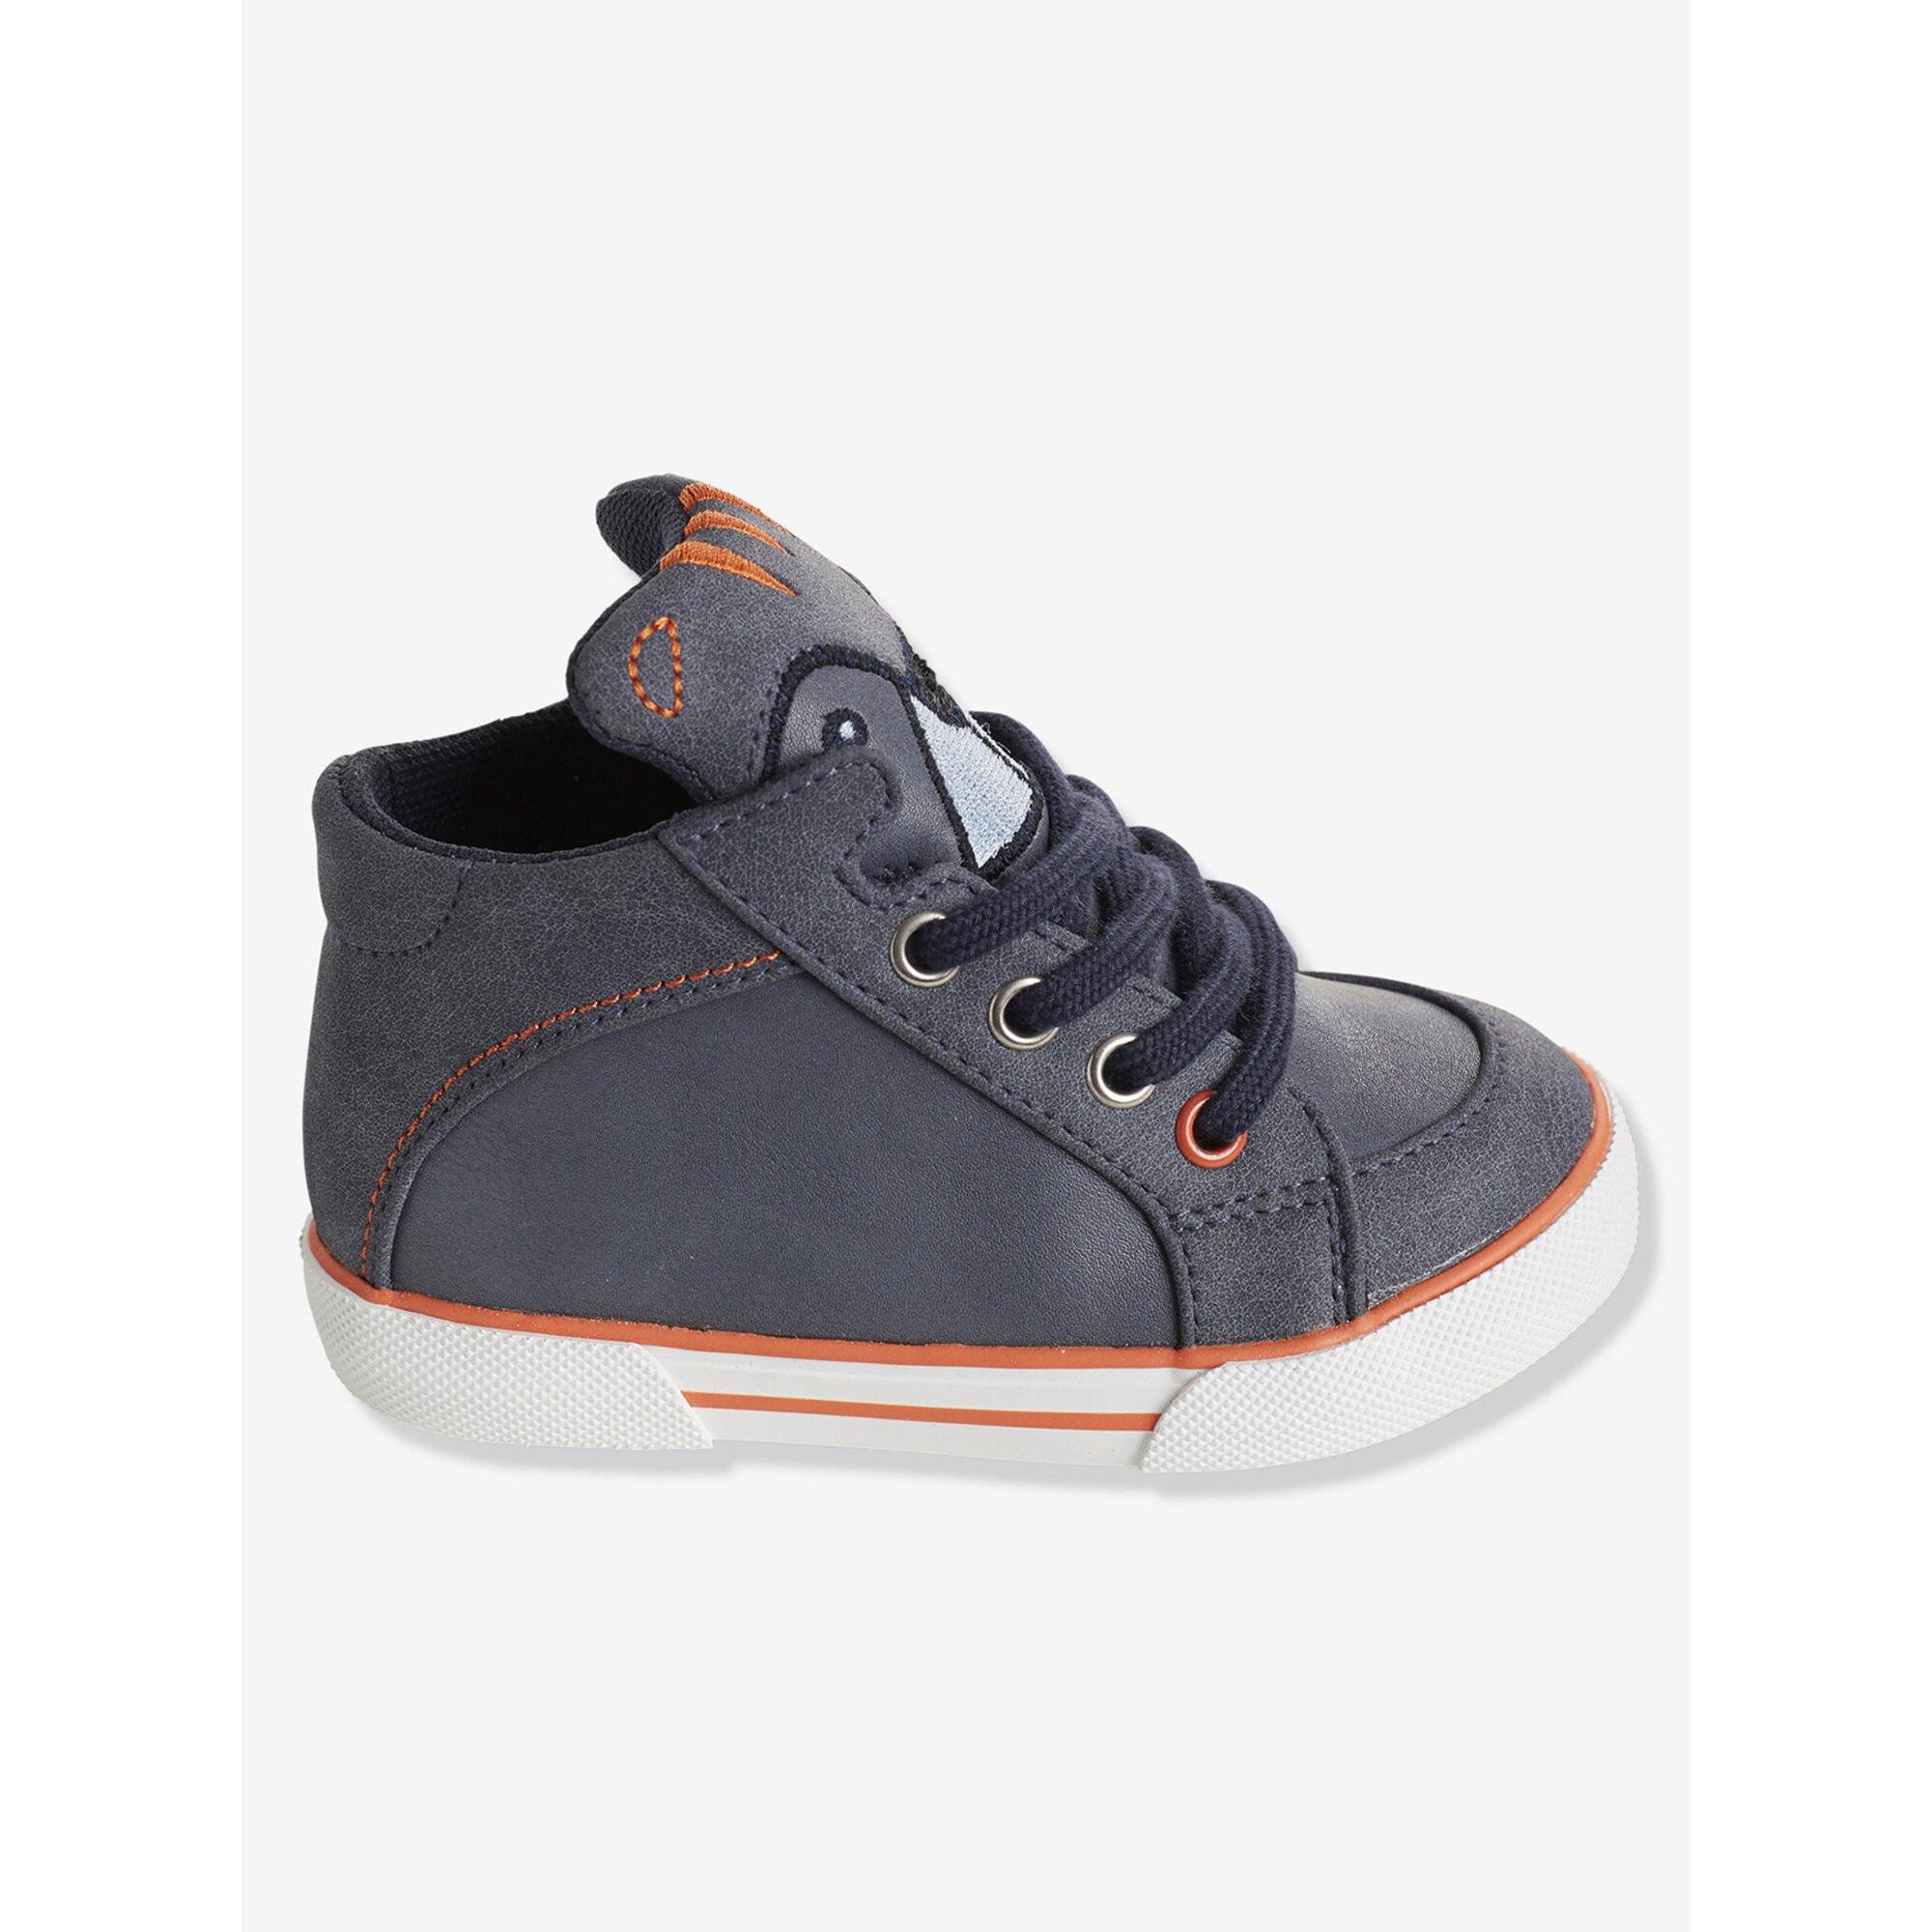 vertbaudet-high-sneakers-mit-schnurung-jungen, 30.99 EUR @ babywalz-de